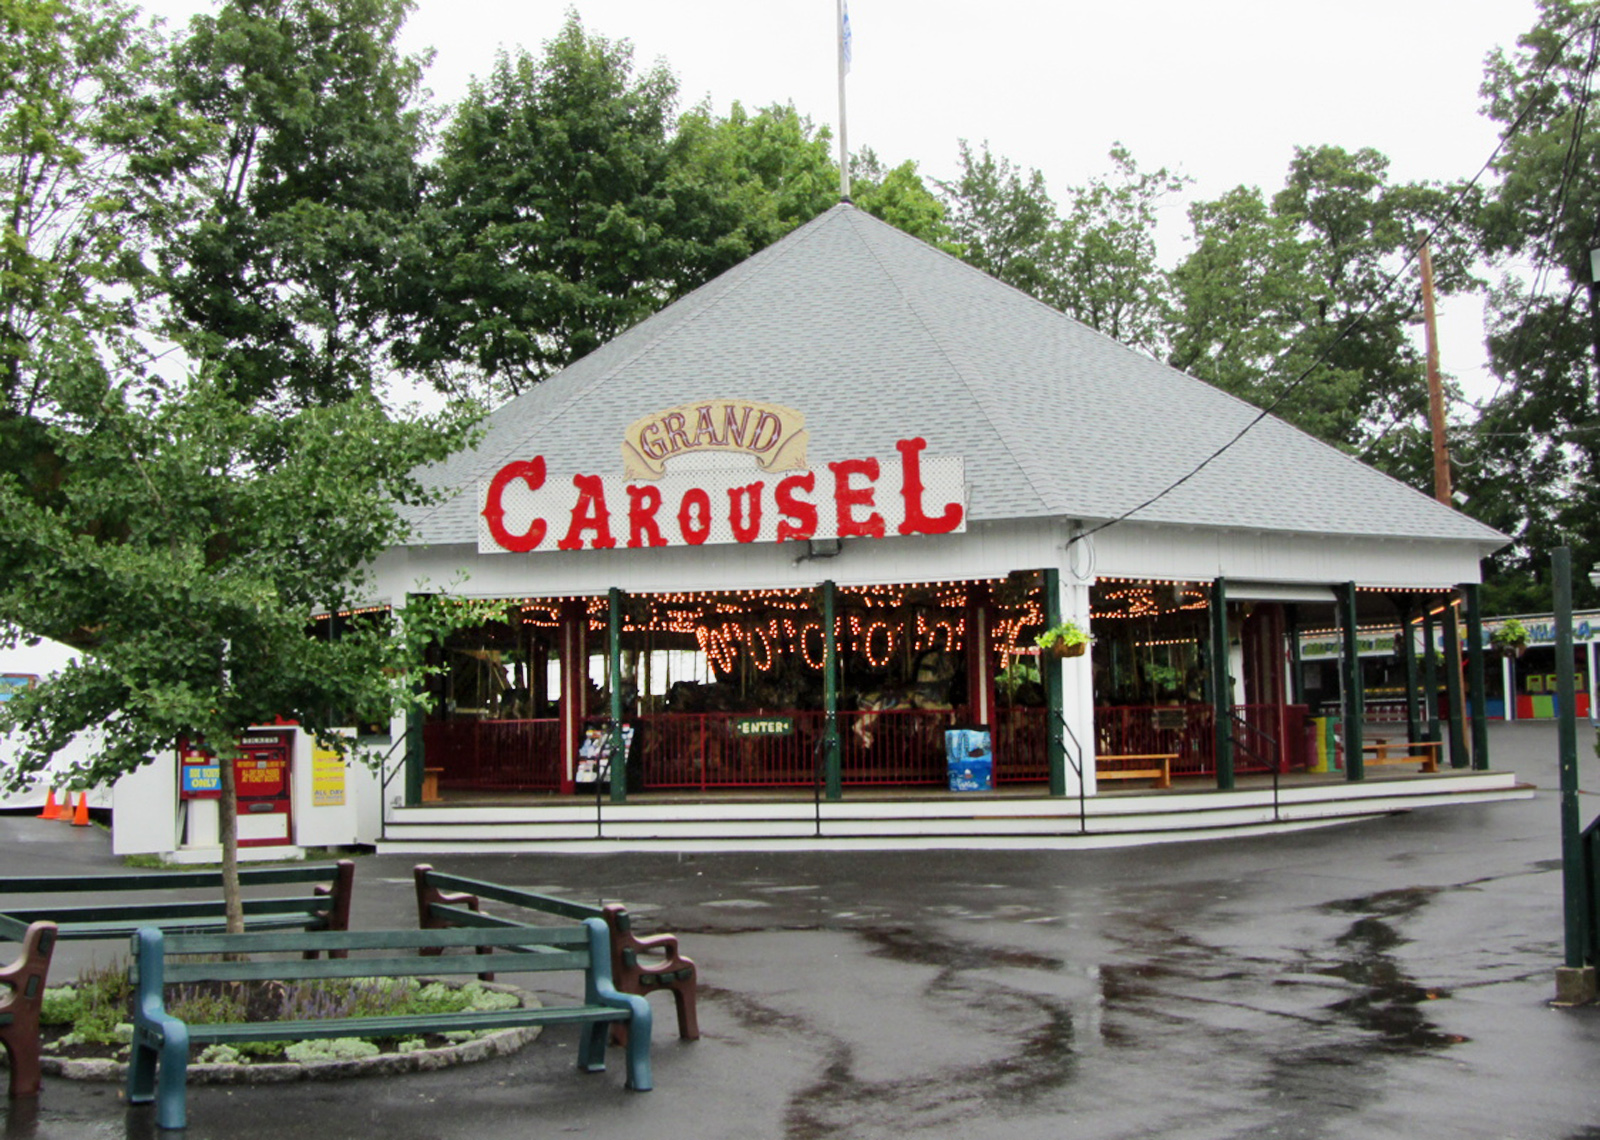 quassy-lake-amusement-park-carousel-building